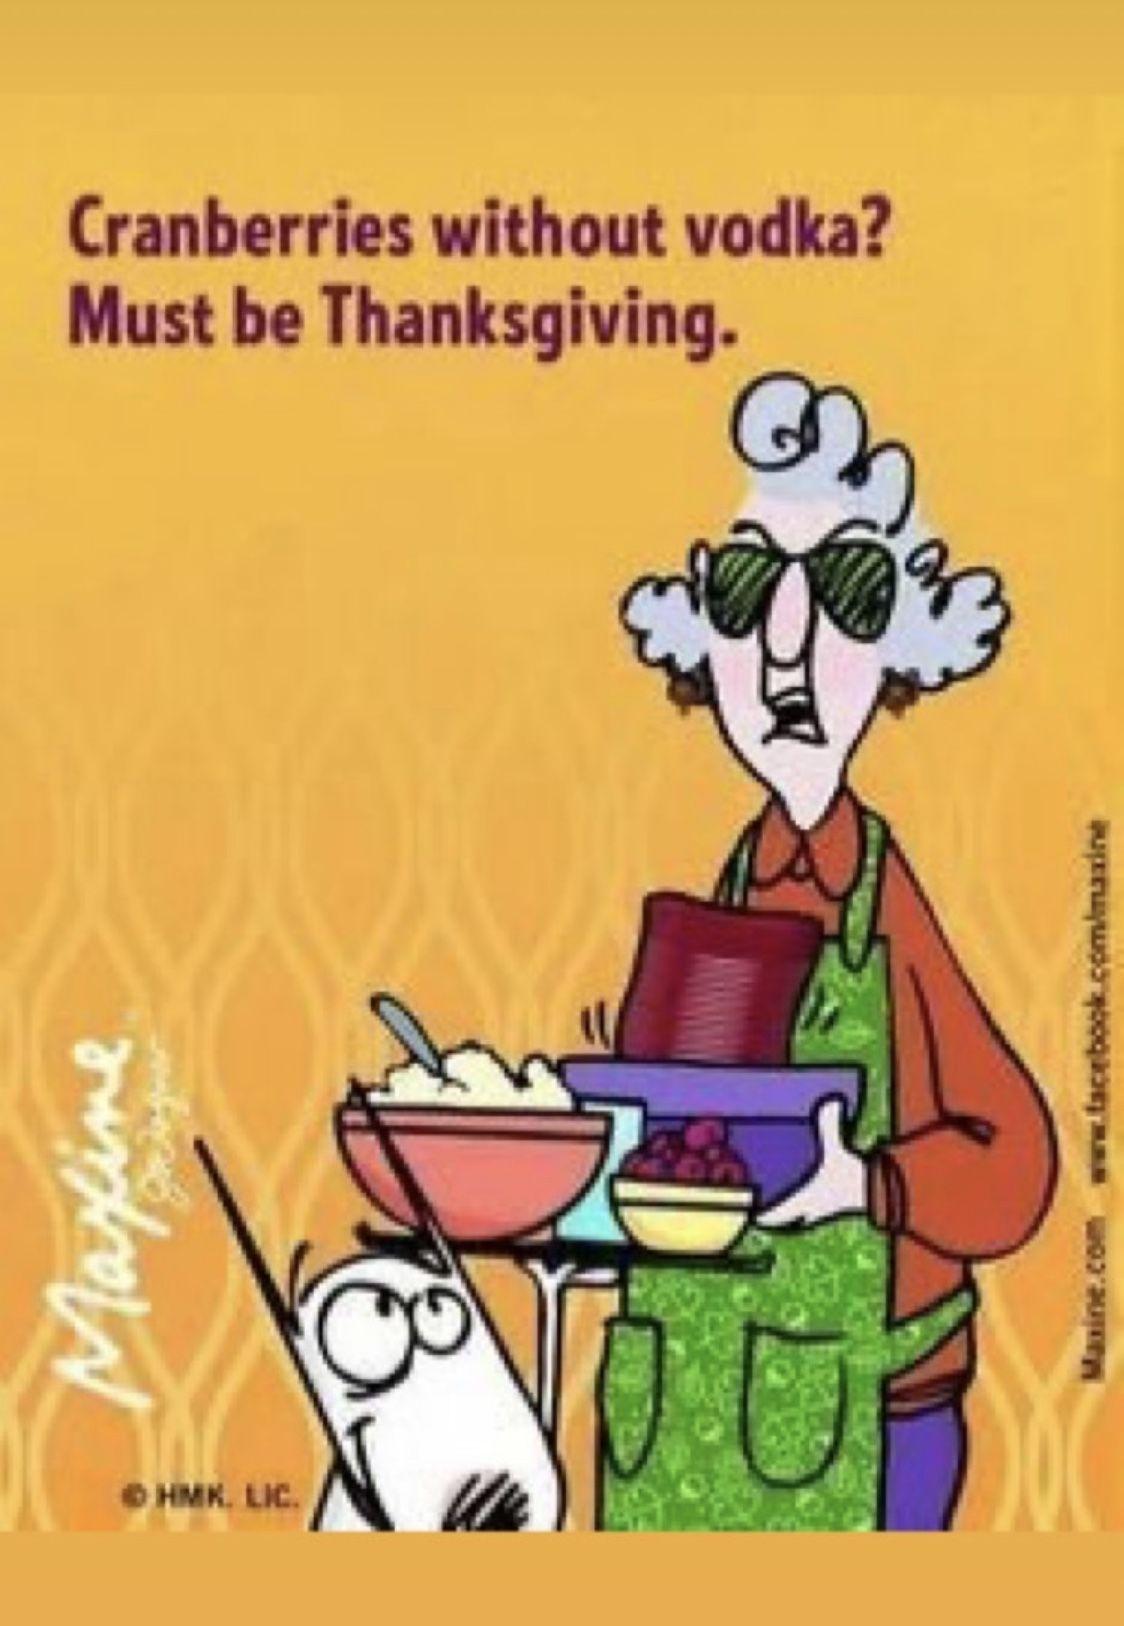 Happy Thanksgiving peeps! memes Thanksgiving jokes